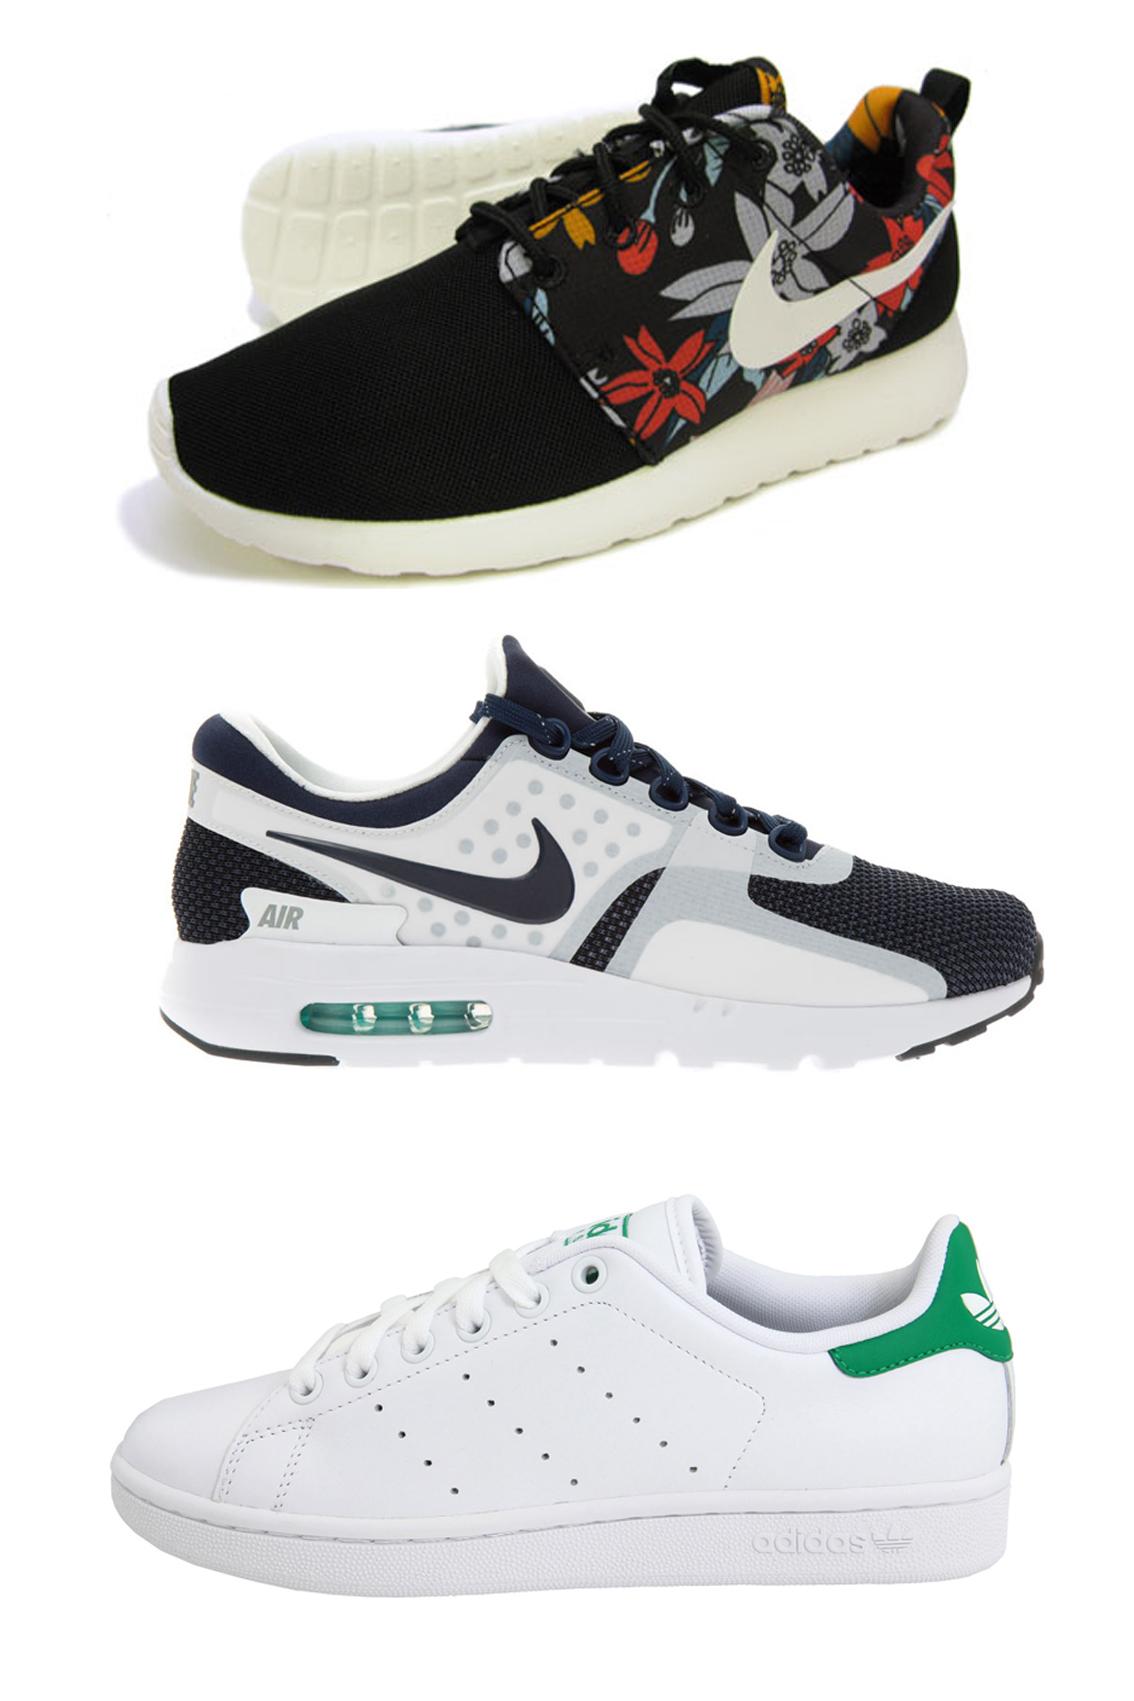 Nike Roshe Tropical Pack, Air Max Zero, Stan Smith Adidas